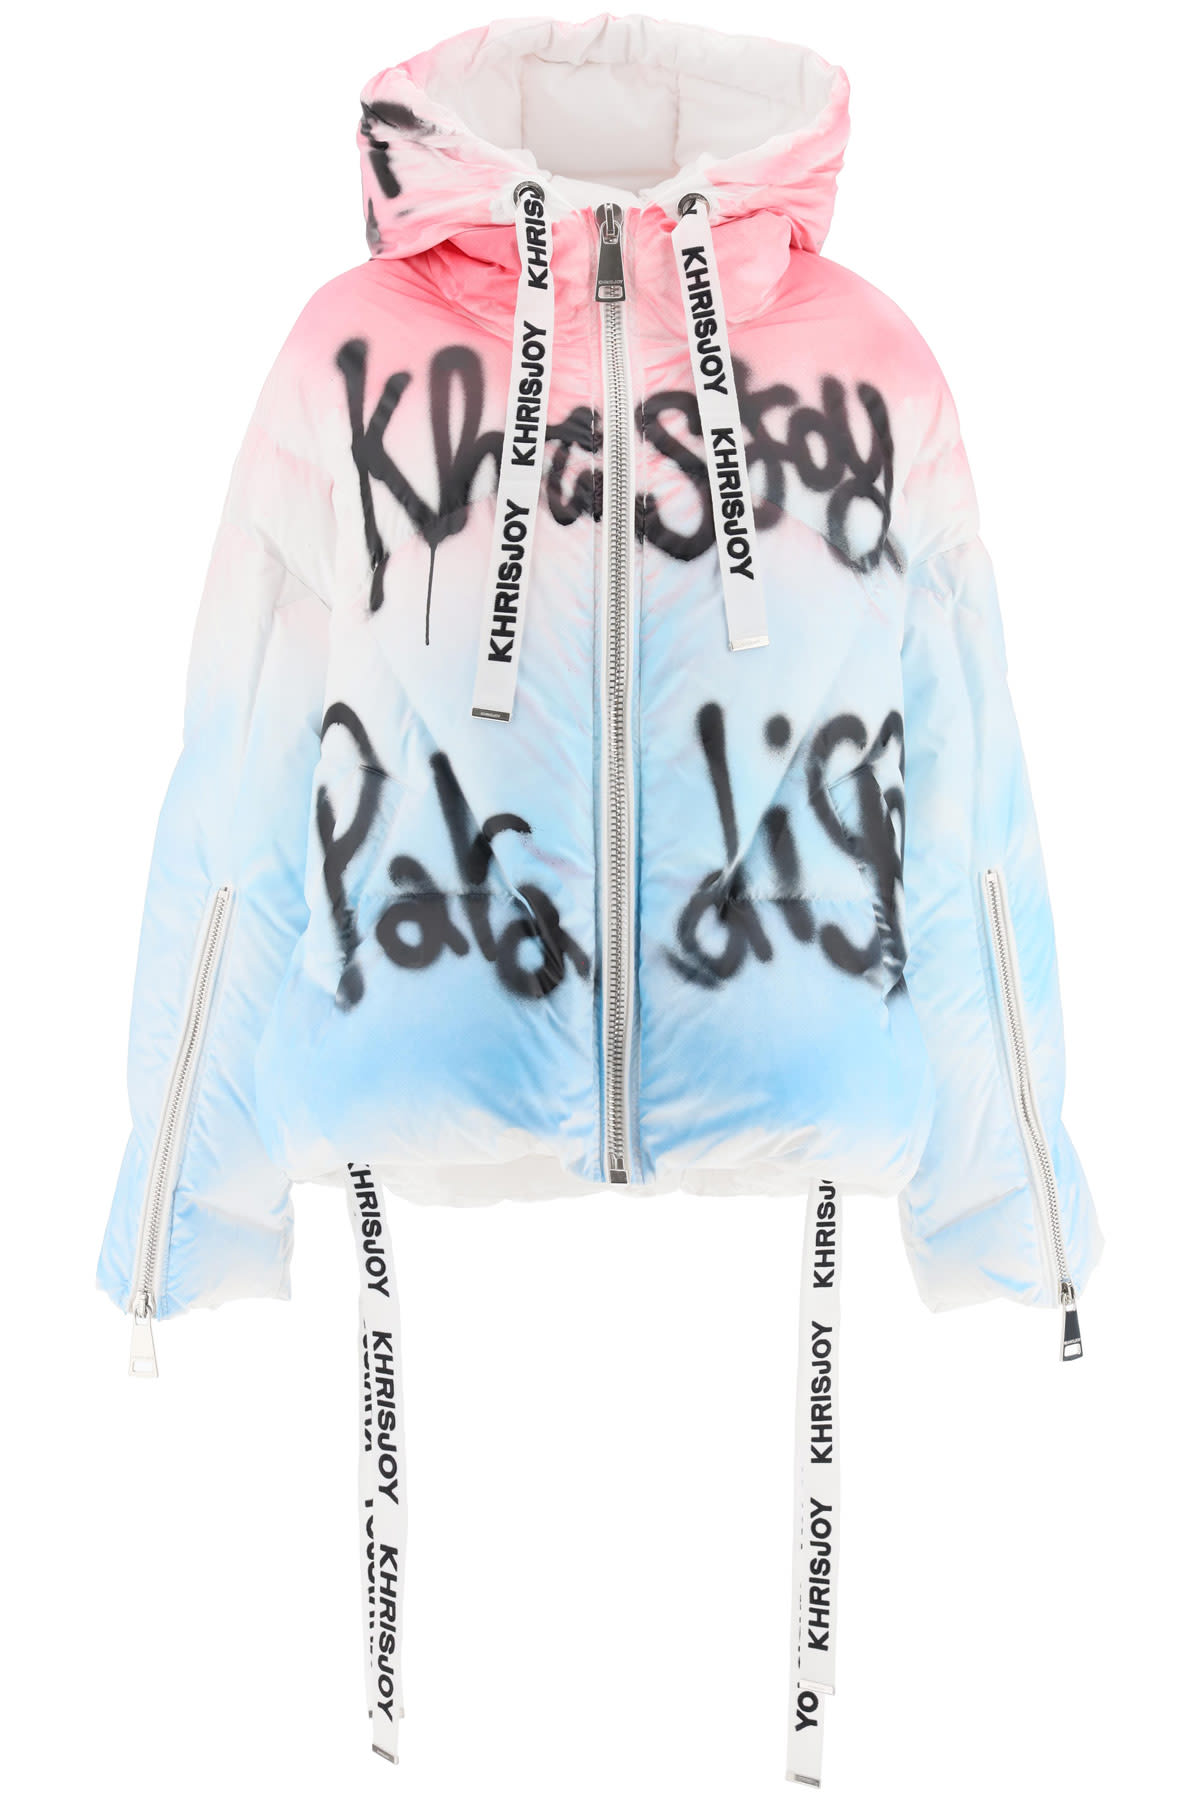 Khrisjoy Graffiti Print Khris Puffer Jacket